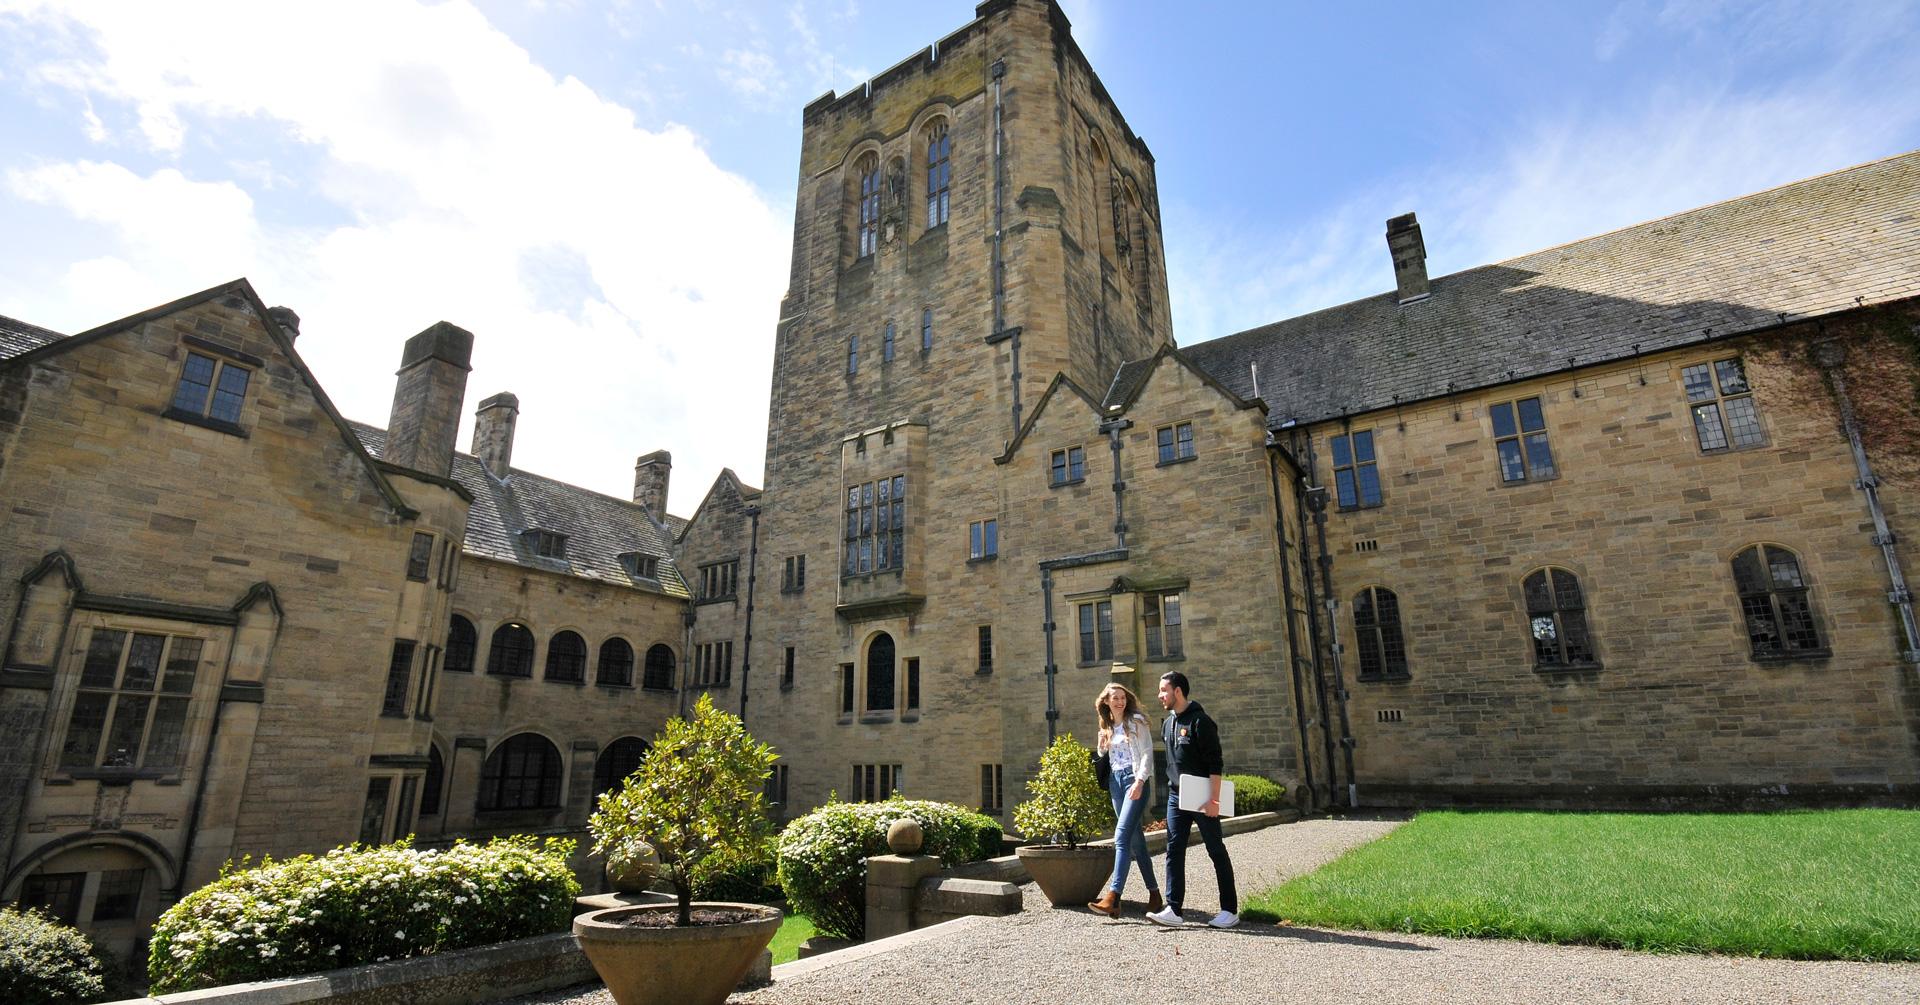 Bangor University Quad